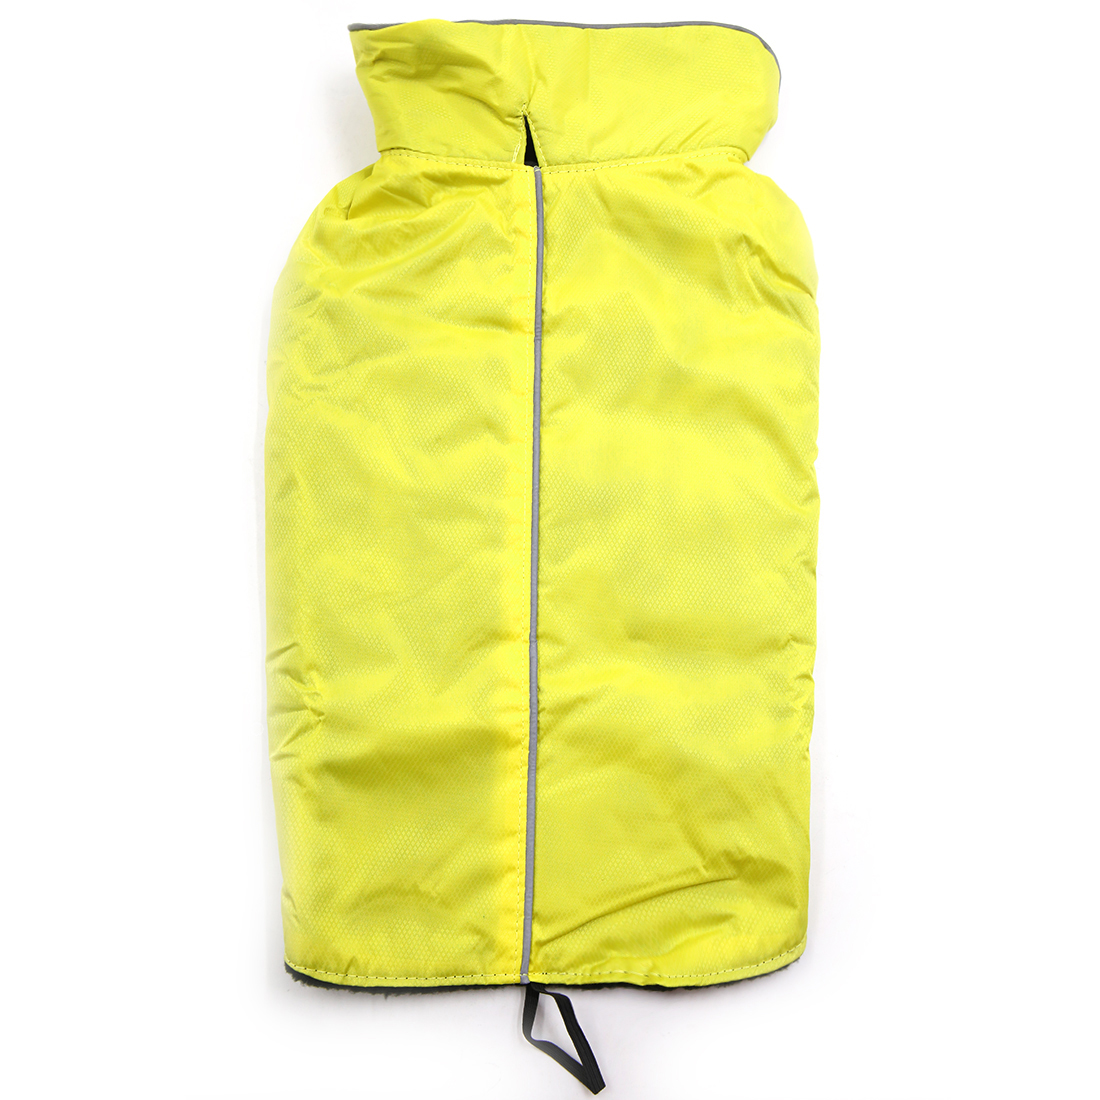 Reflective Waterproof Dog Vest Jacket Clothes Soft Warm Fleece Lining Dog Coat Clothing Yellow L